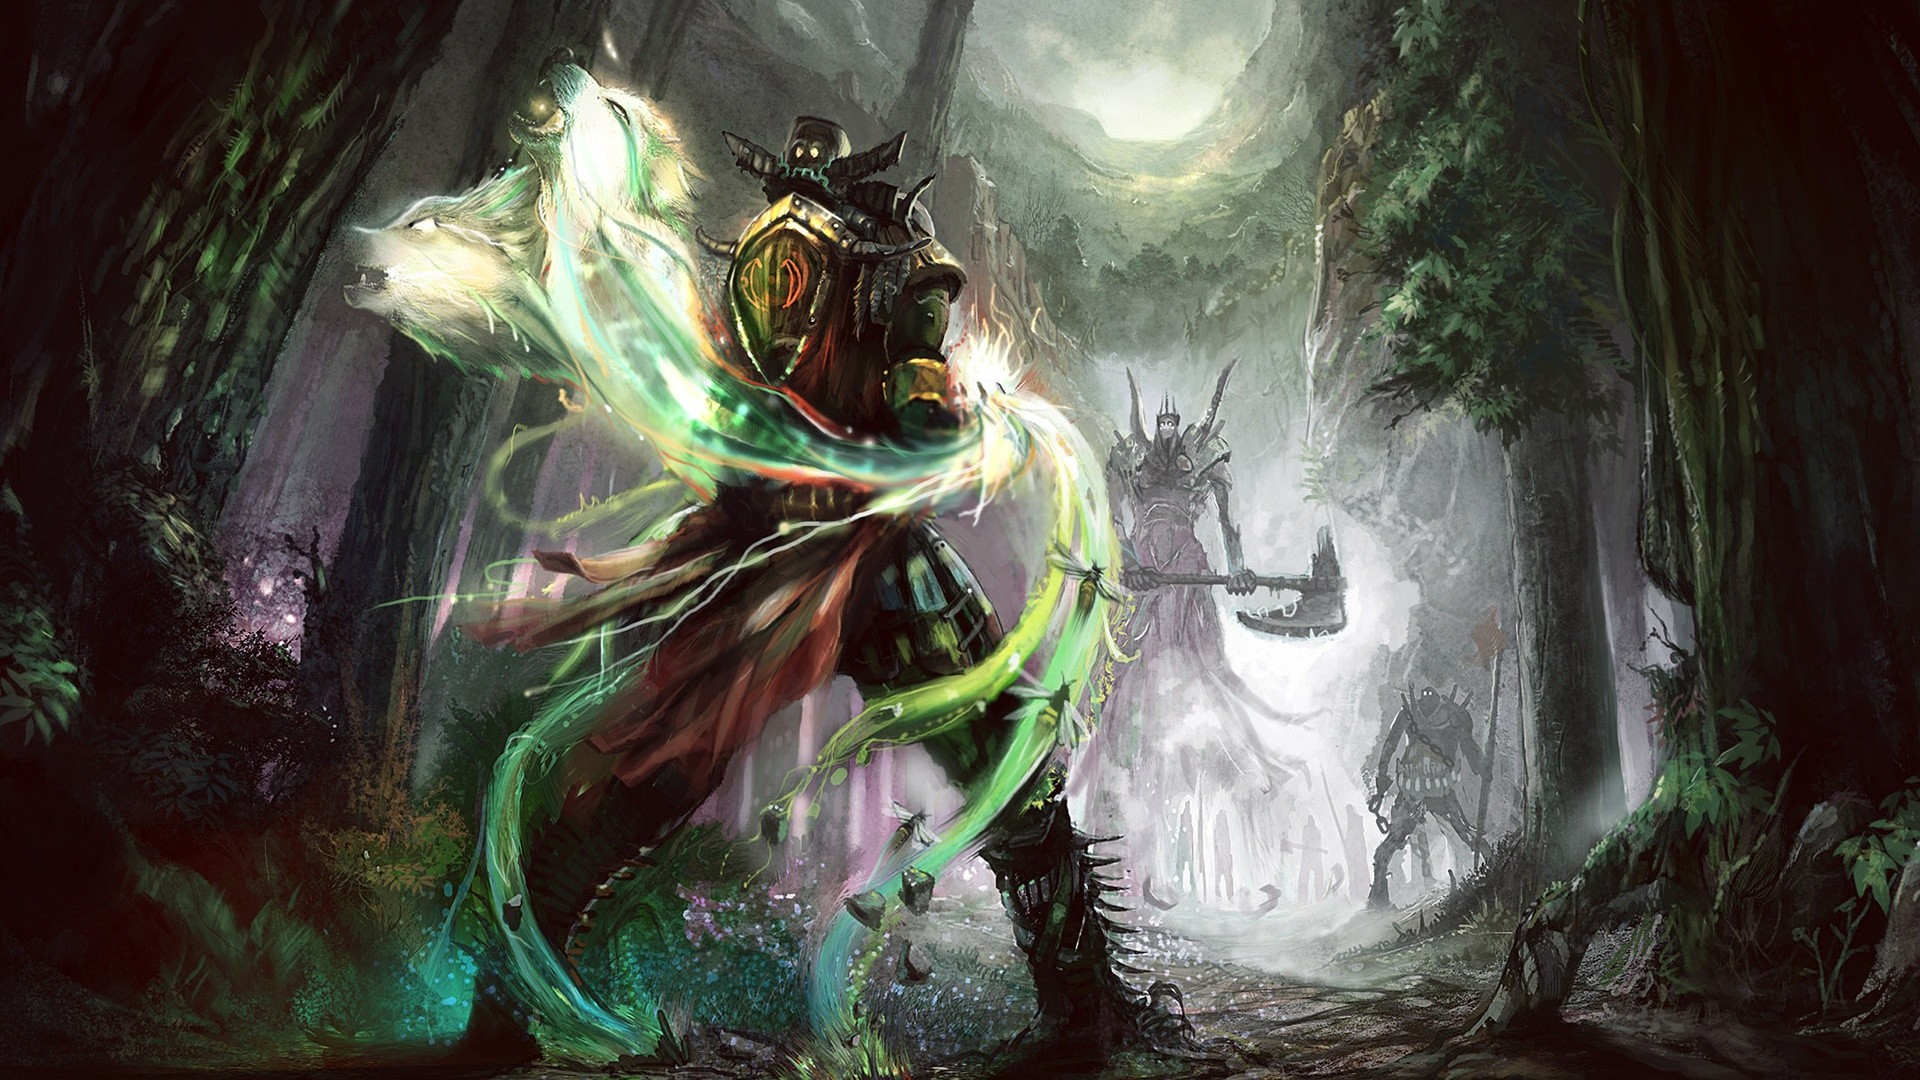 fantasy warrior Wallpaper Backgrounds